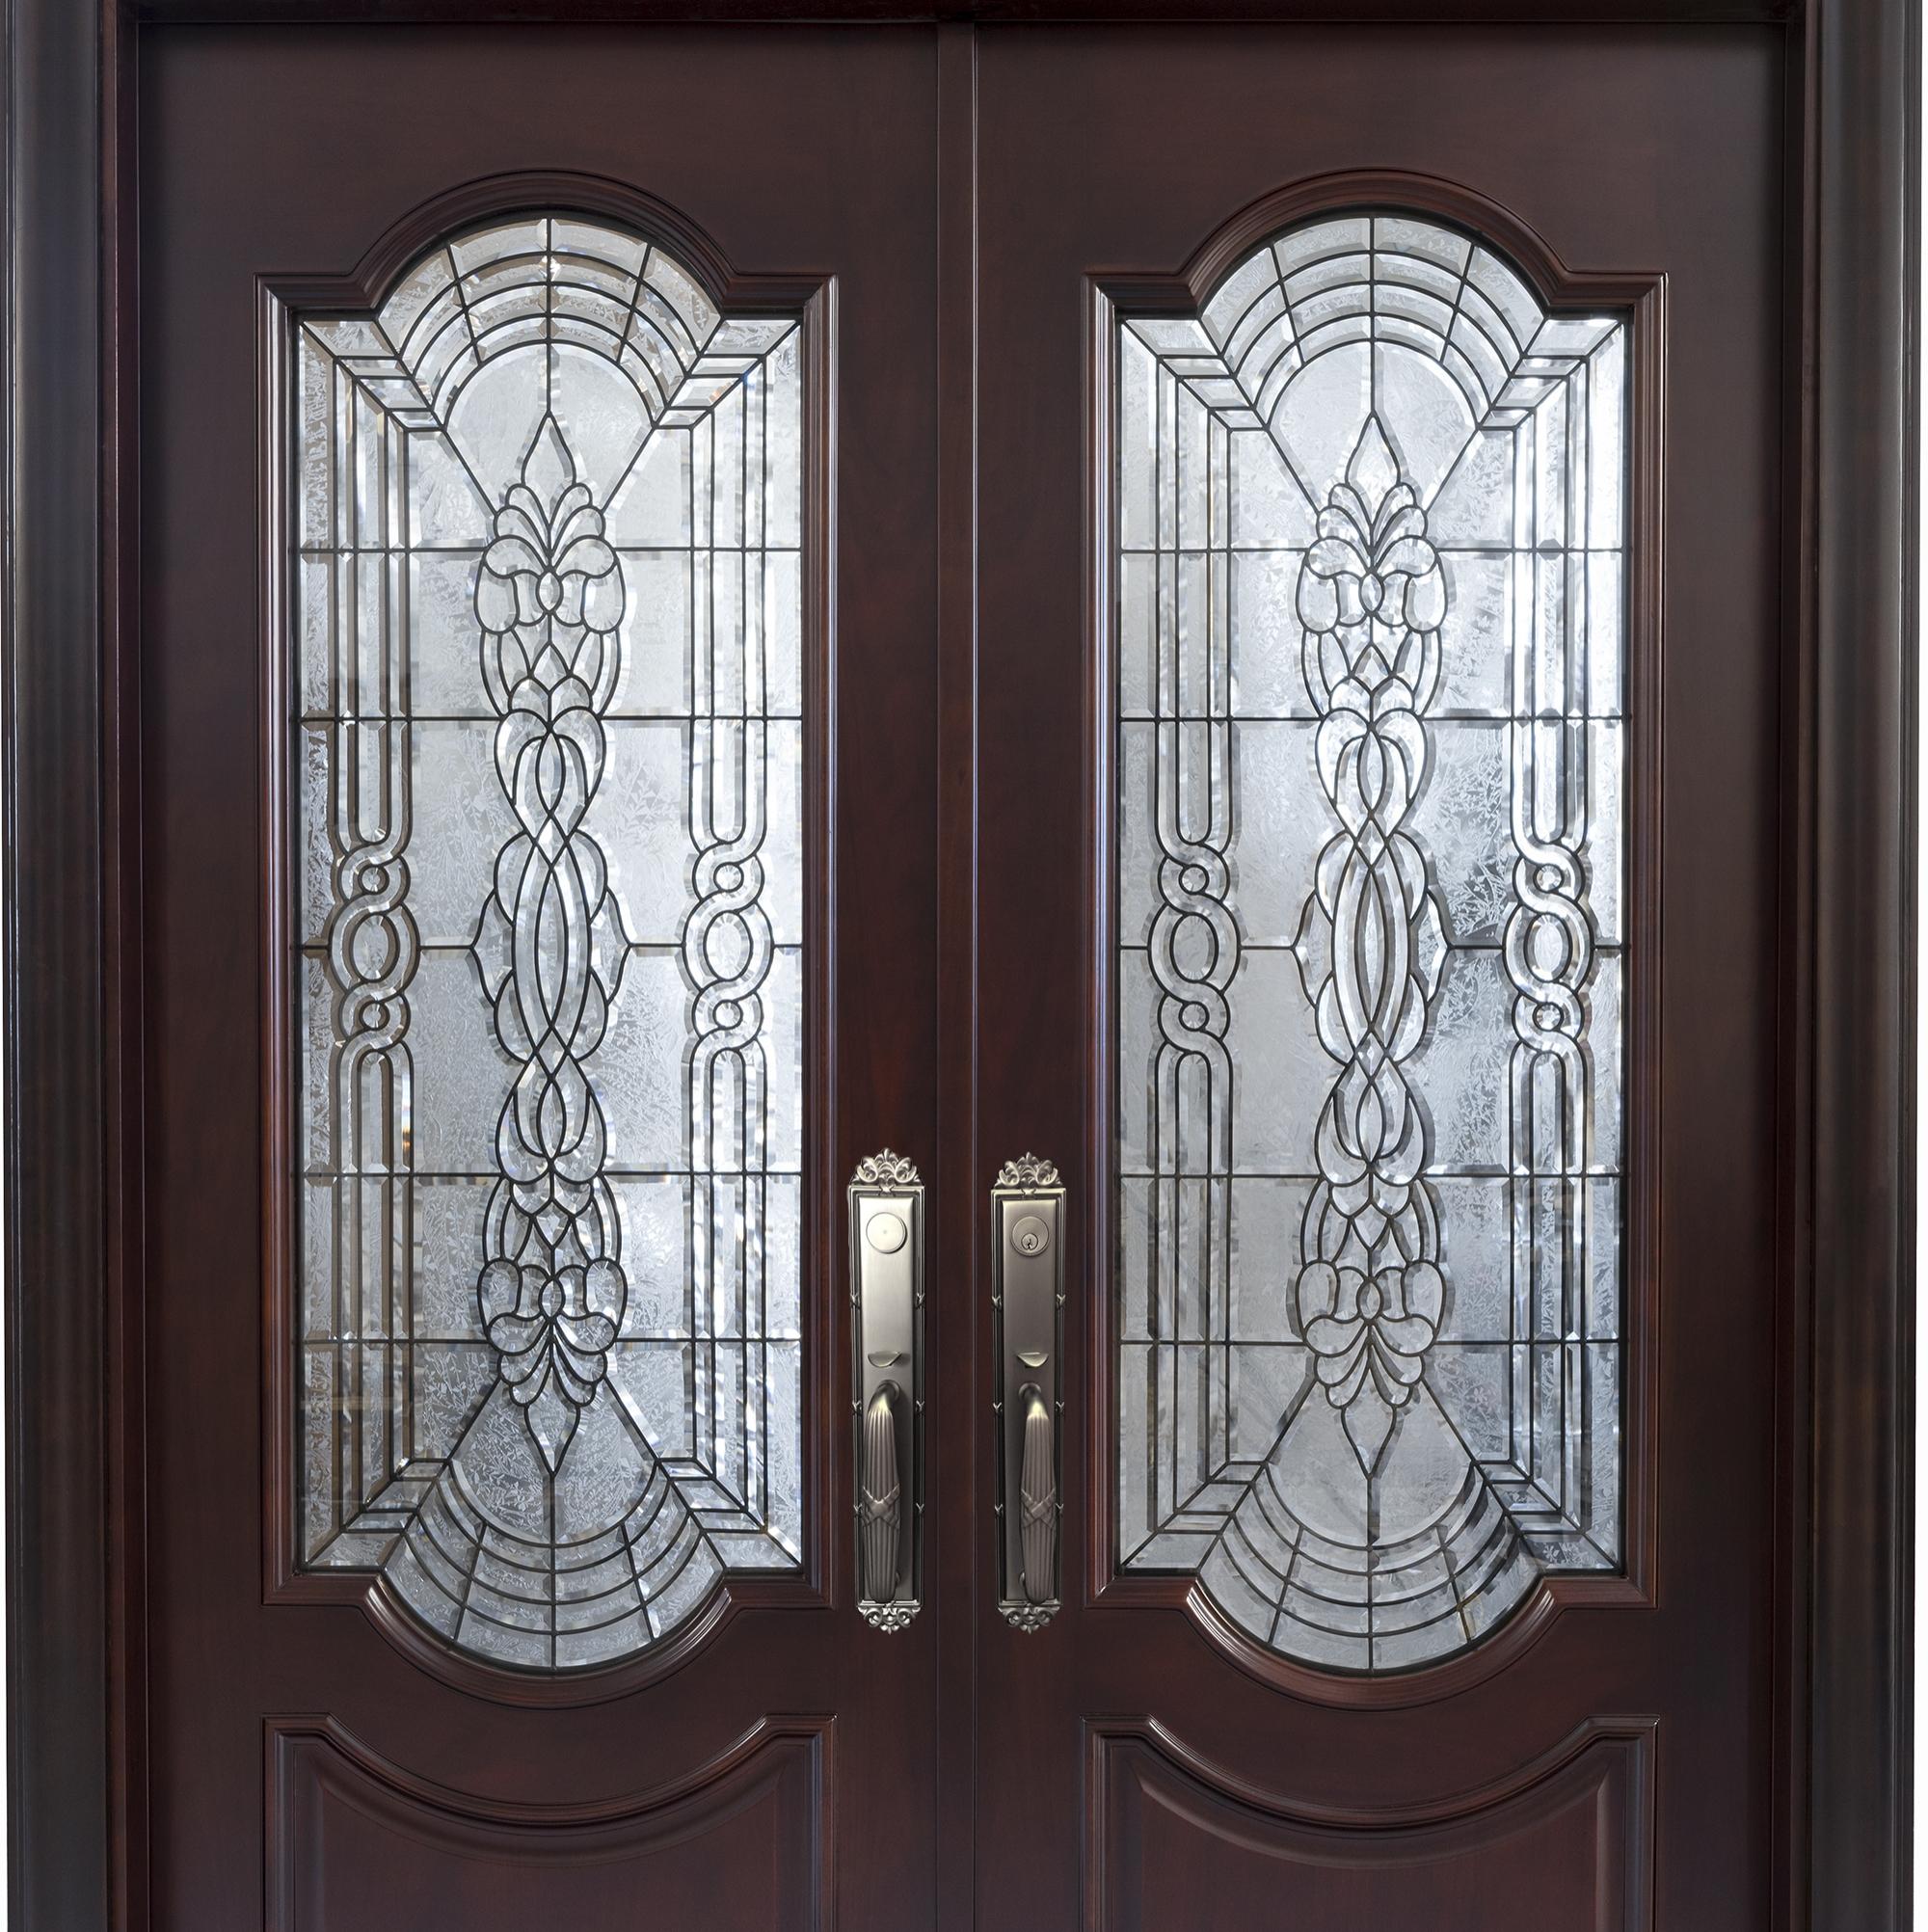 Classic Door Gallery   In stock - starting at $3,999